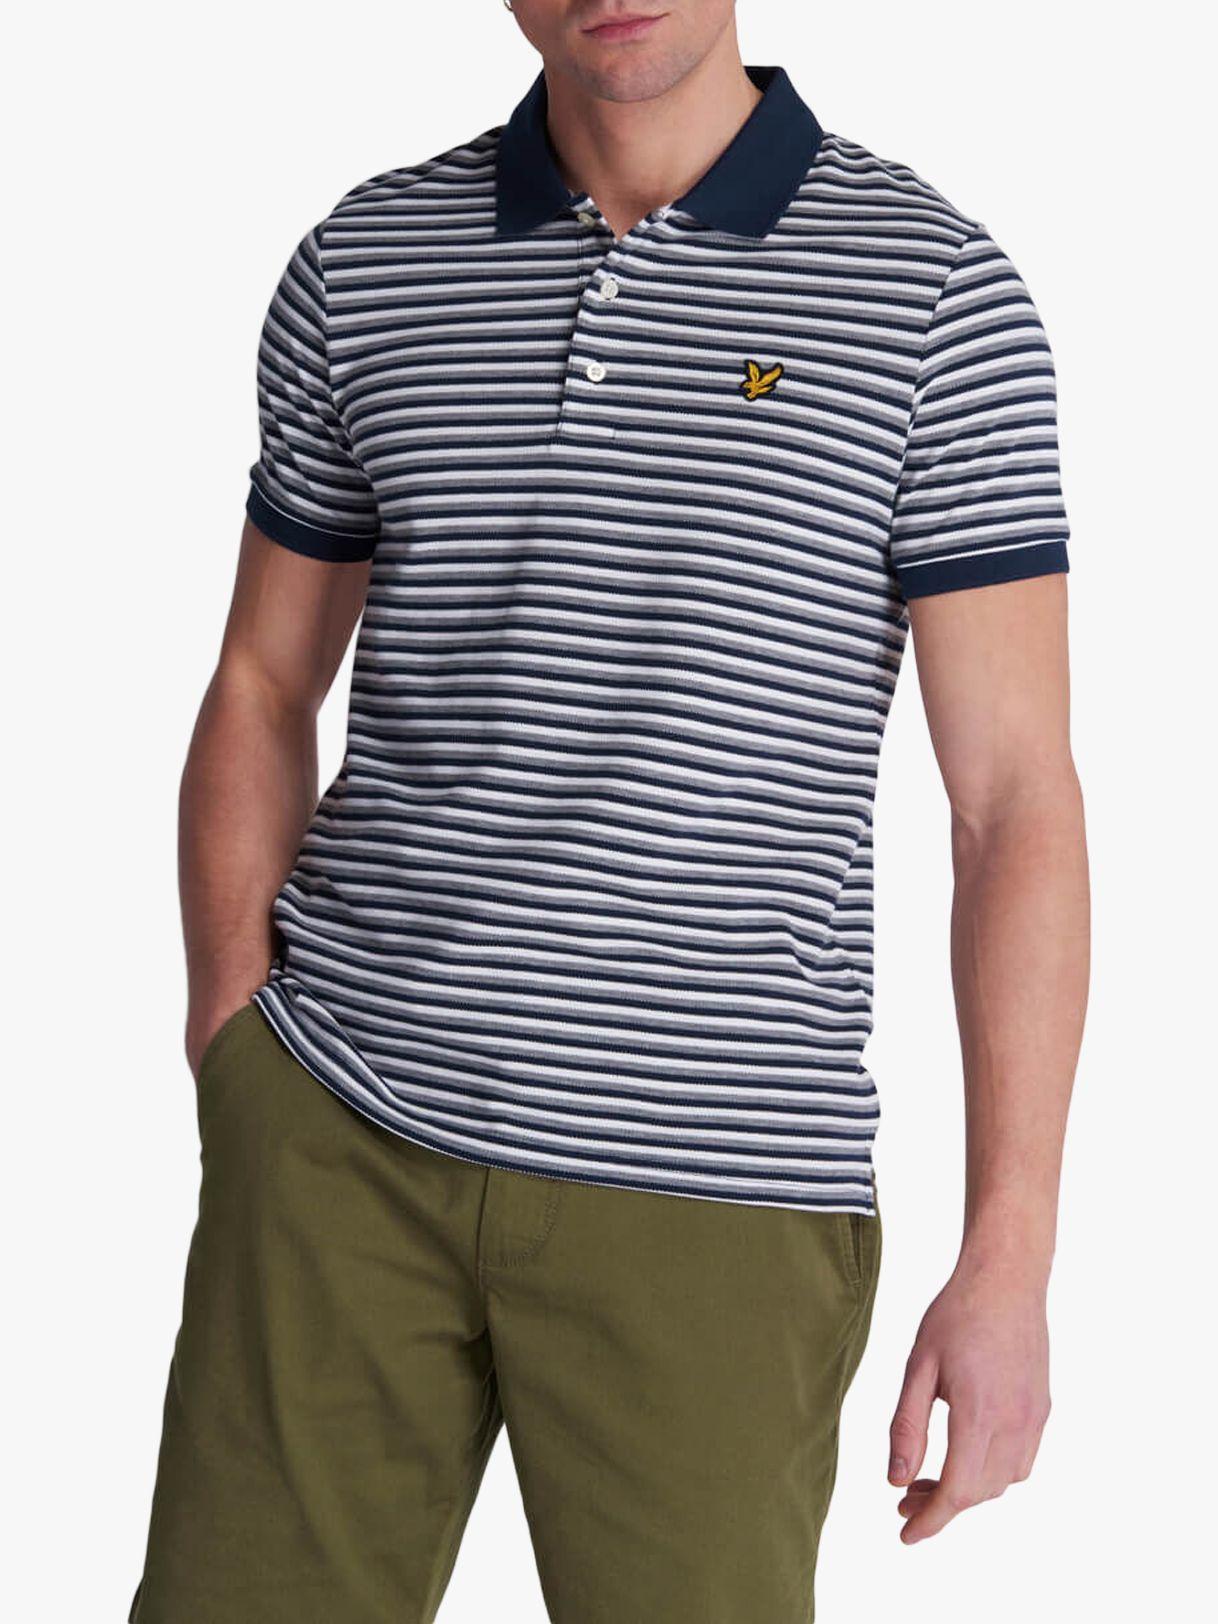 Lyle & Scott Lyle & Scott Stripe Polo Shirt, Navy